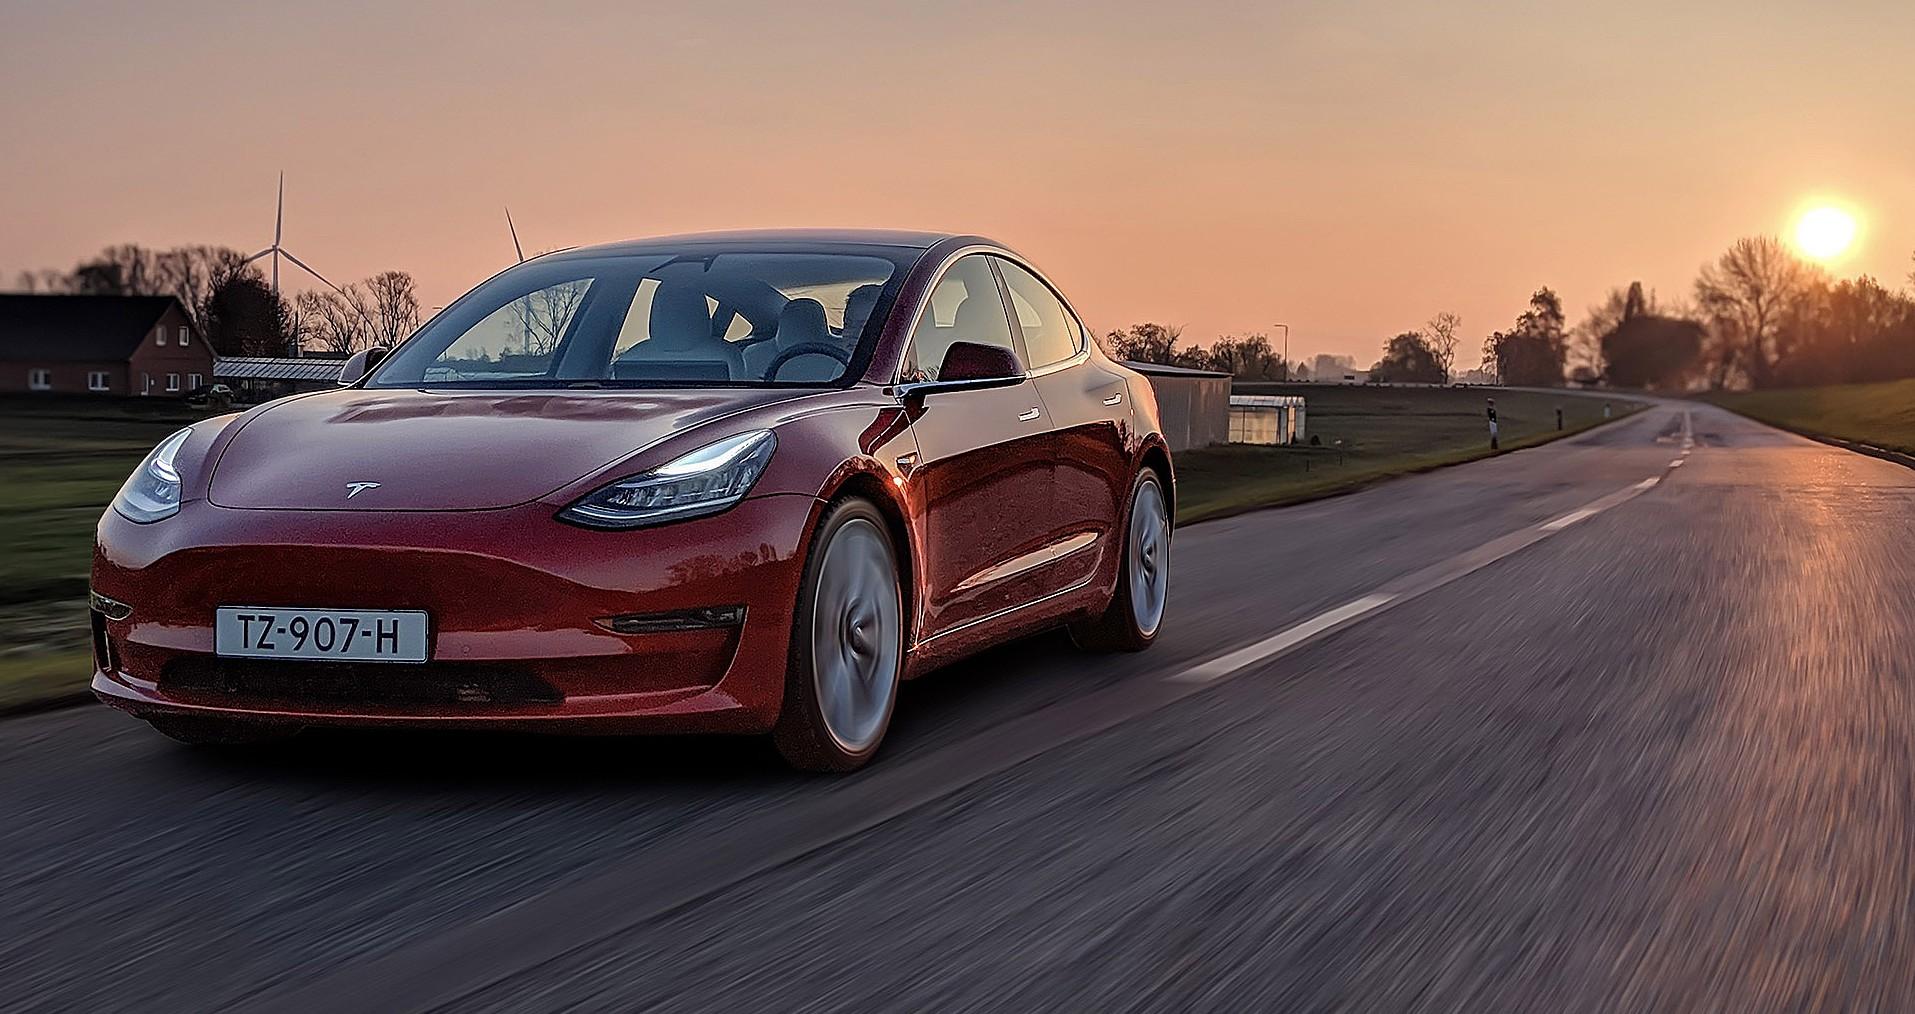 Tesla: Ετοιμάζει μικρό ηλεκτρικό χάτσμπακ με τιμή συμβατικού αυτοκινήτου!